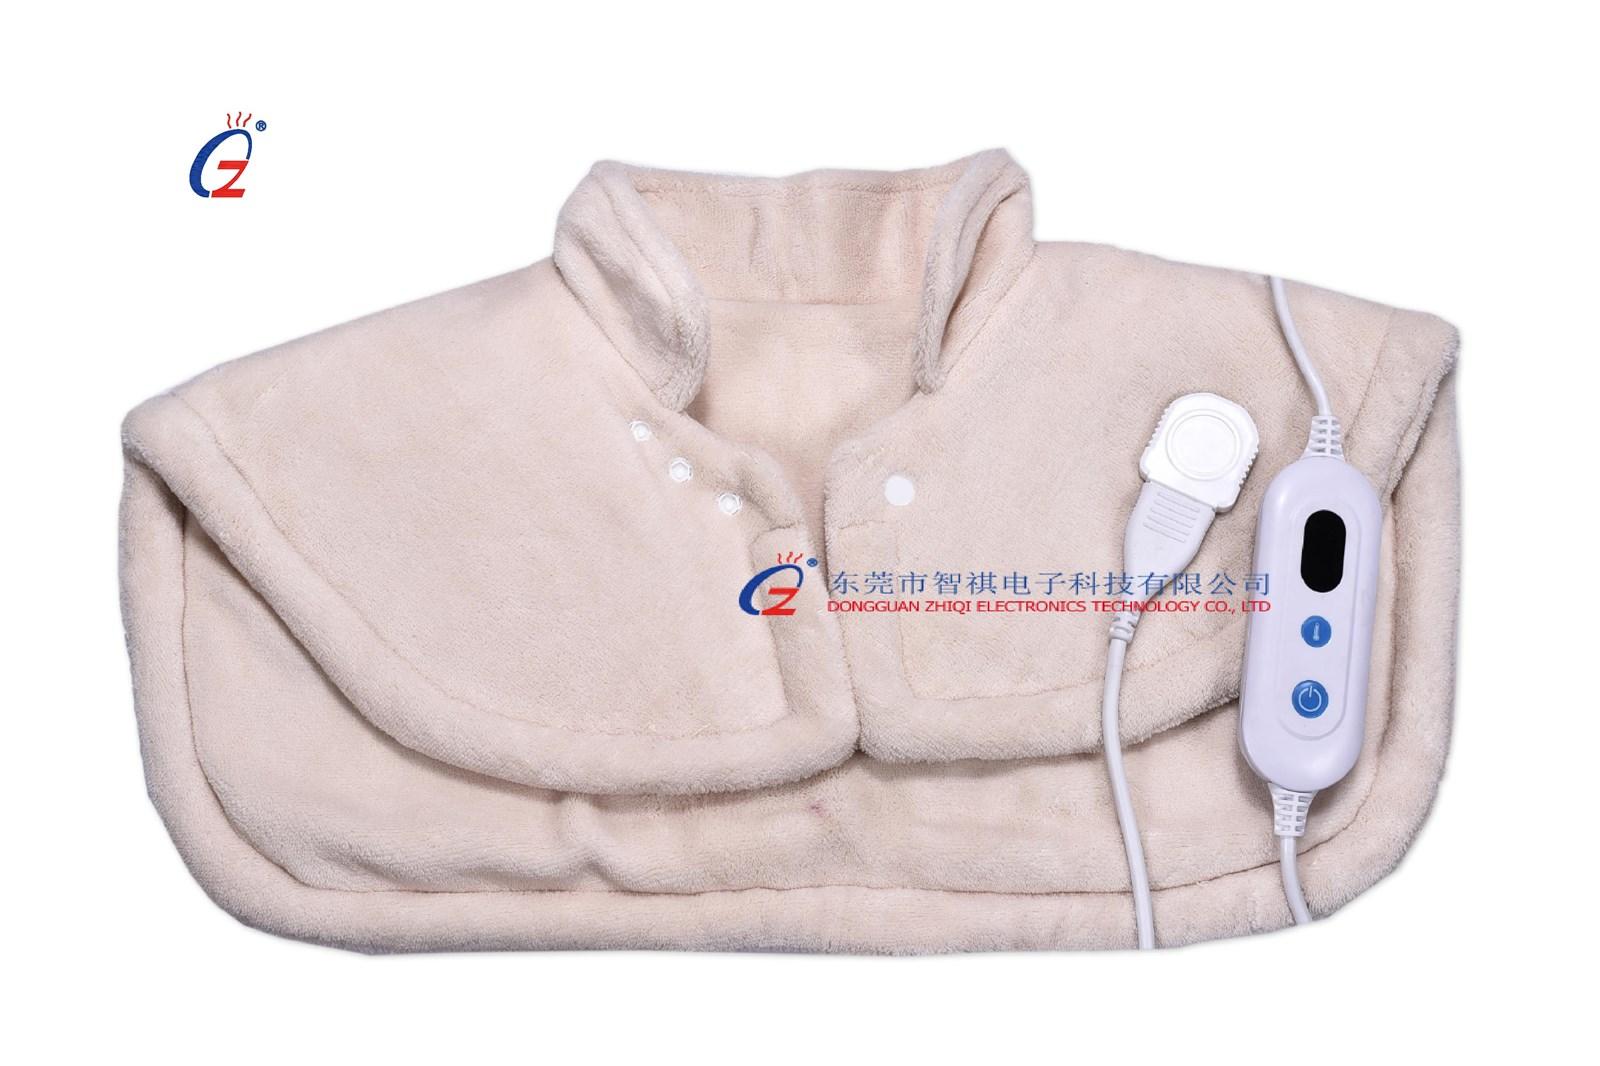 Neck and shoulder heat pad manufactuer Zhiqi Electronics